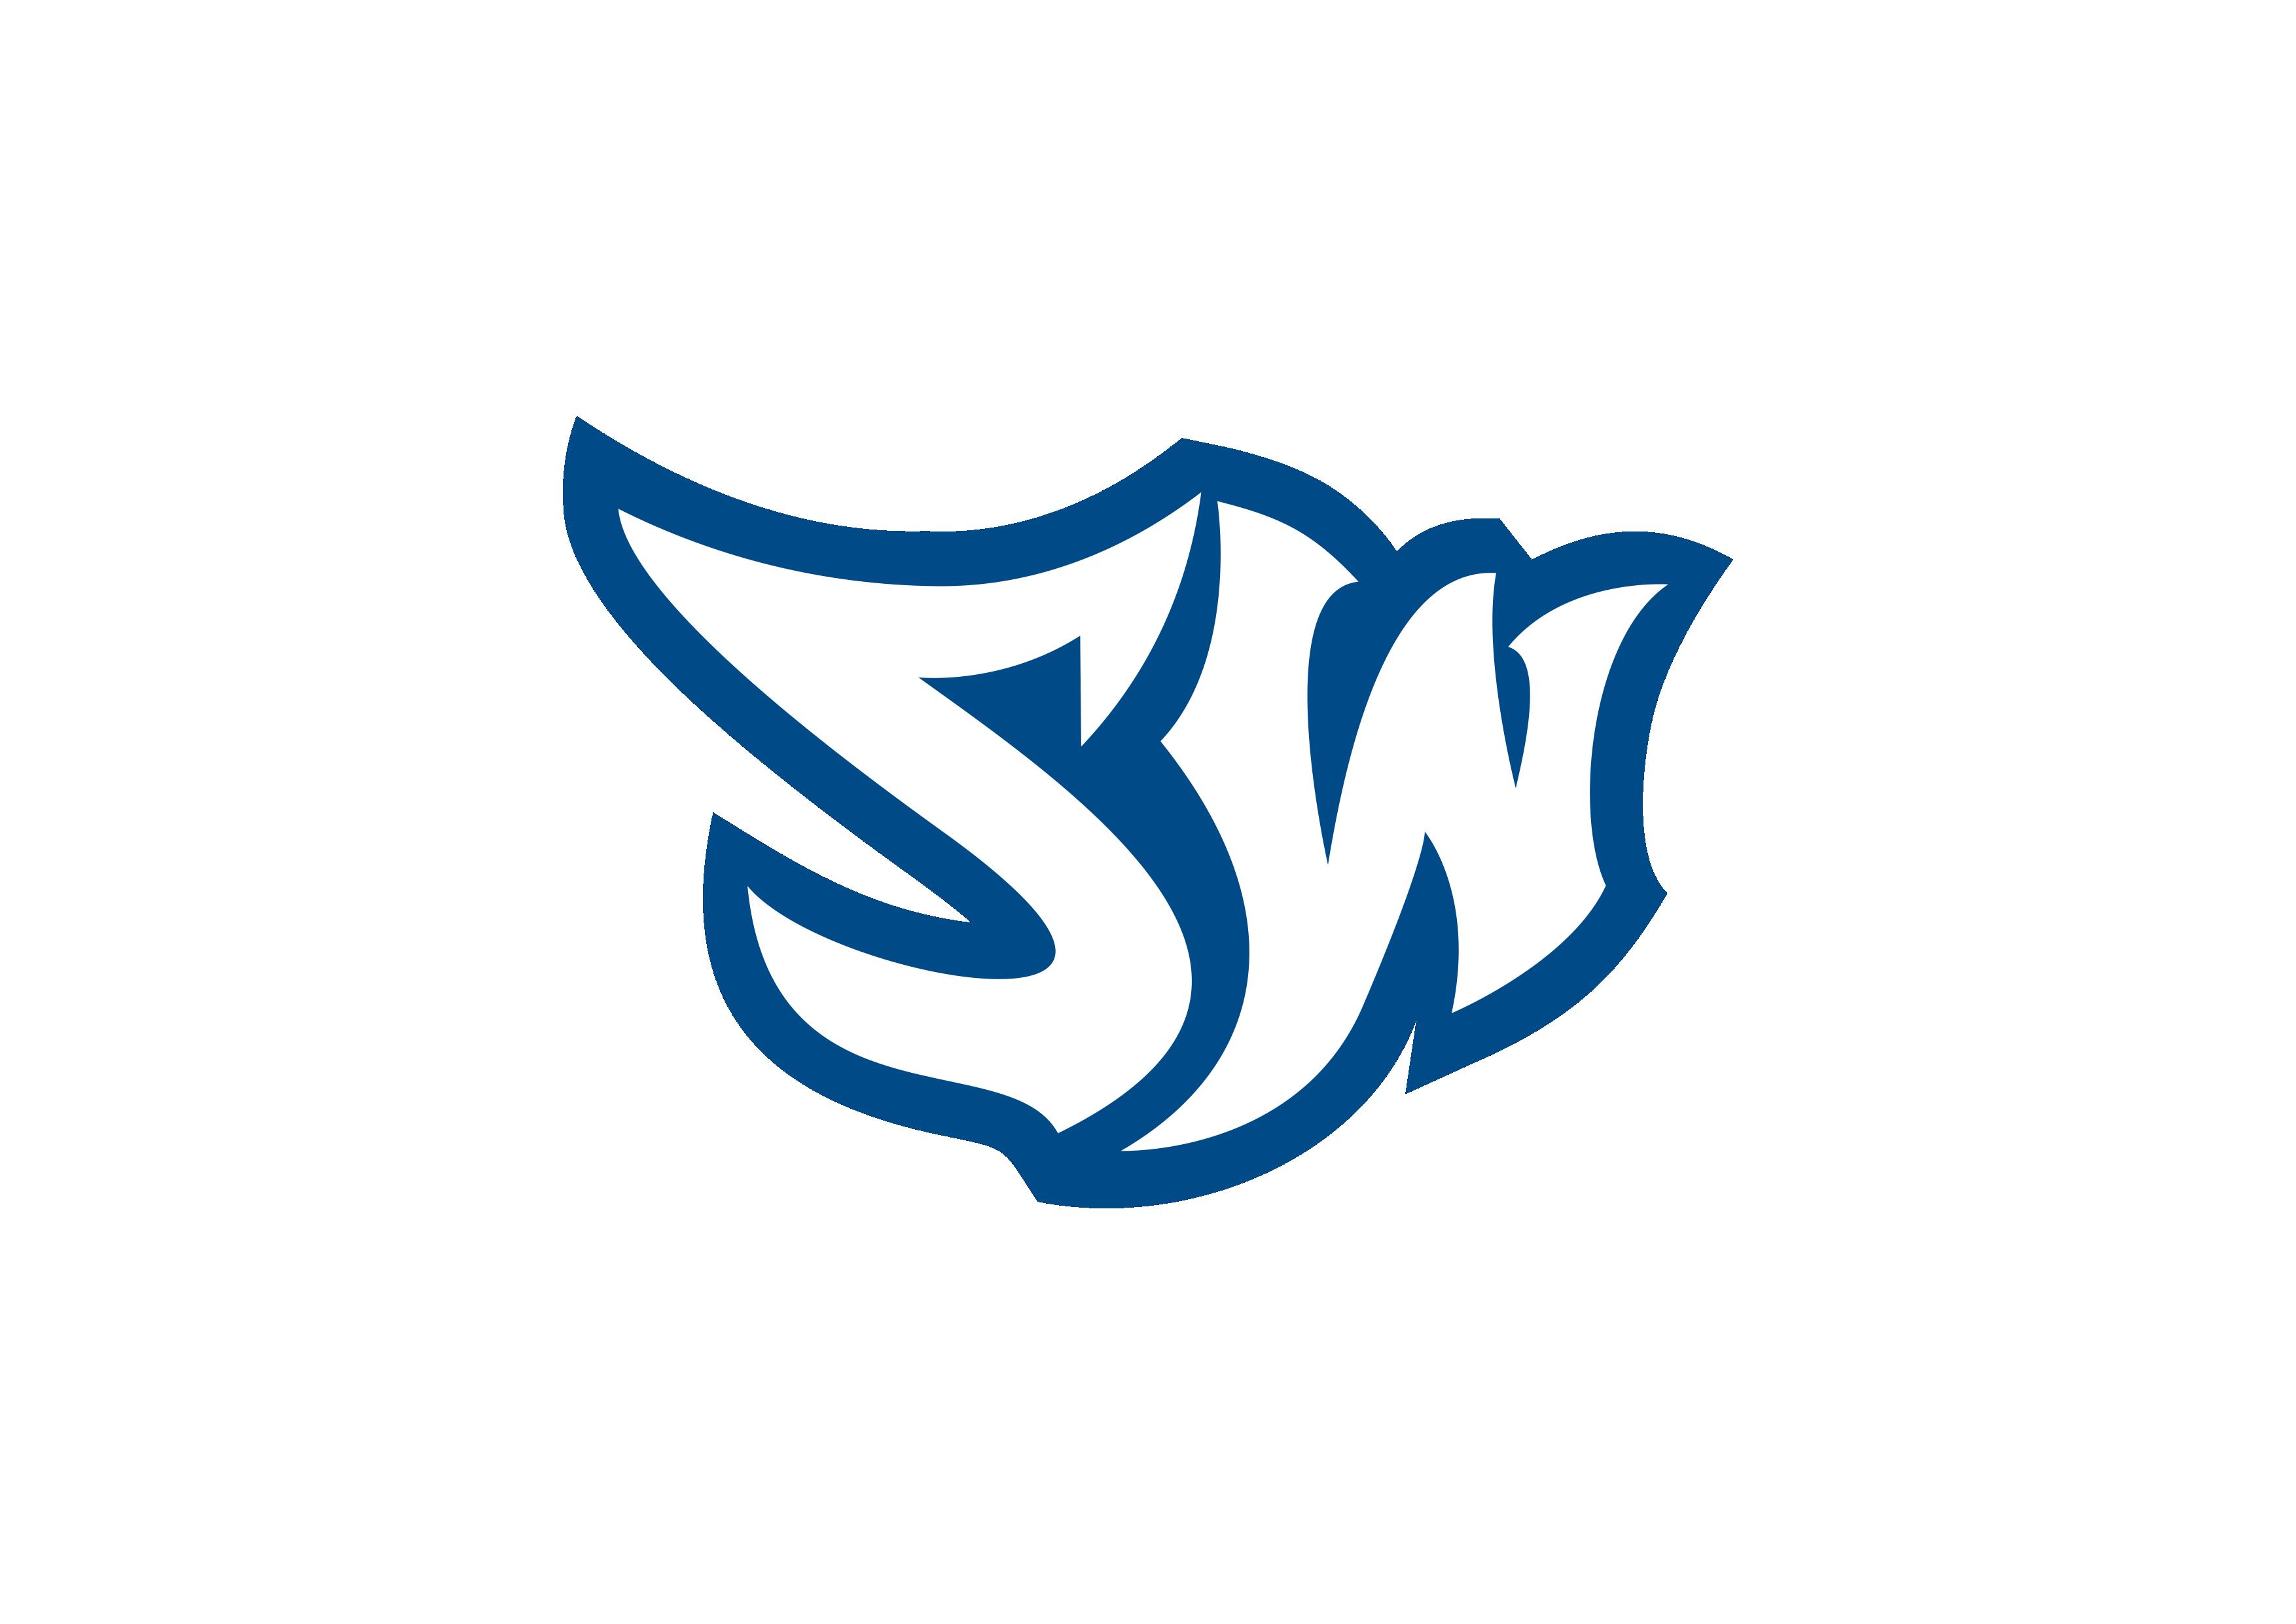 Swedish Wrestling